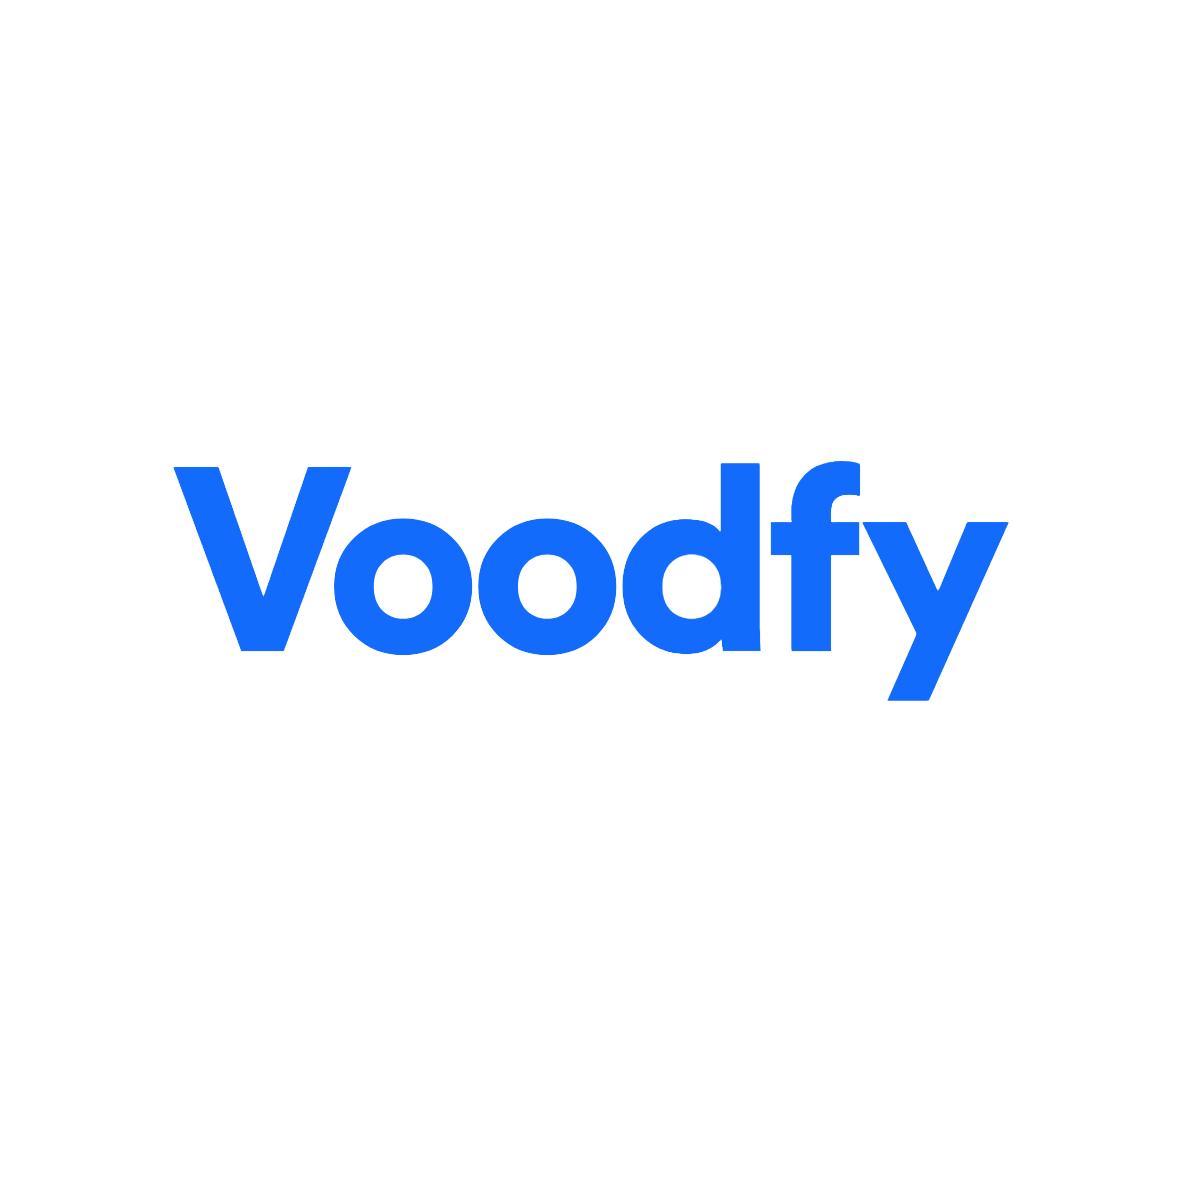 Voodfy